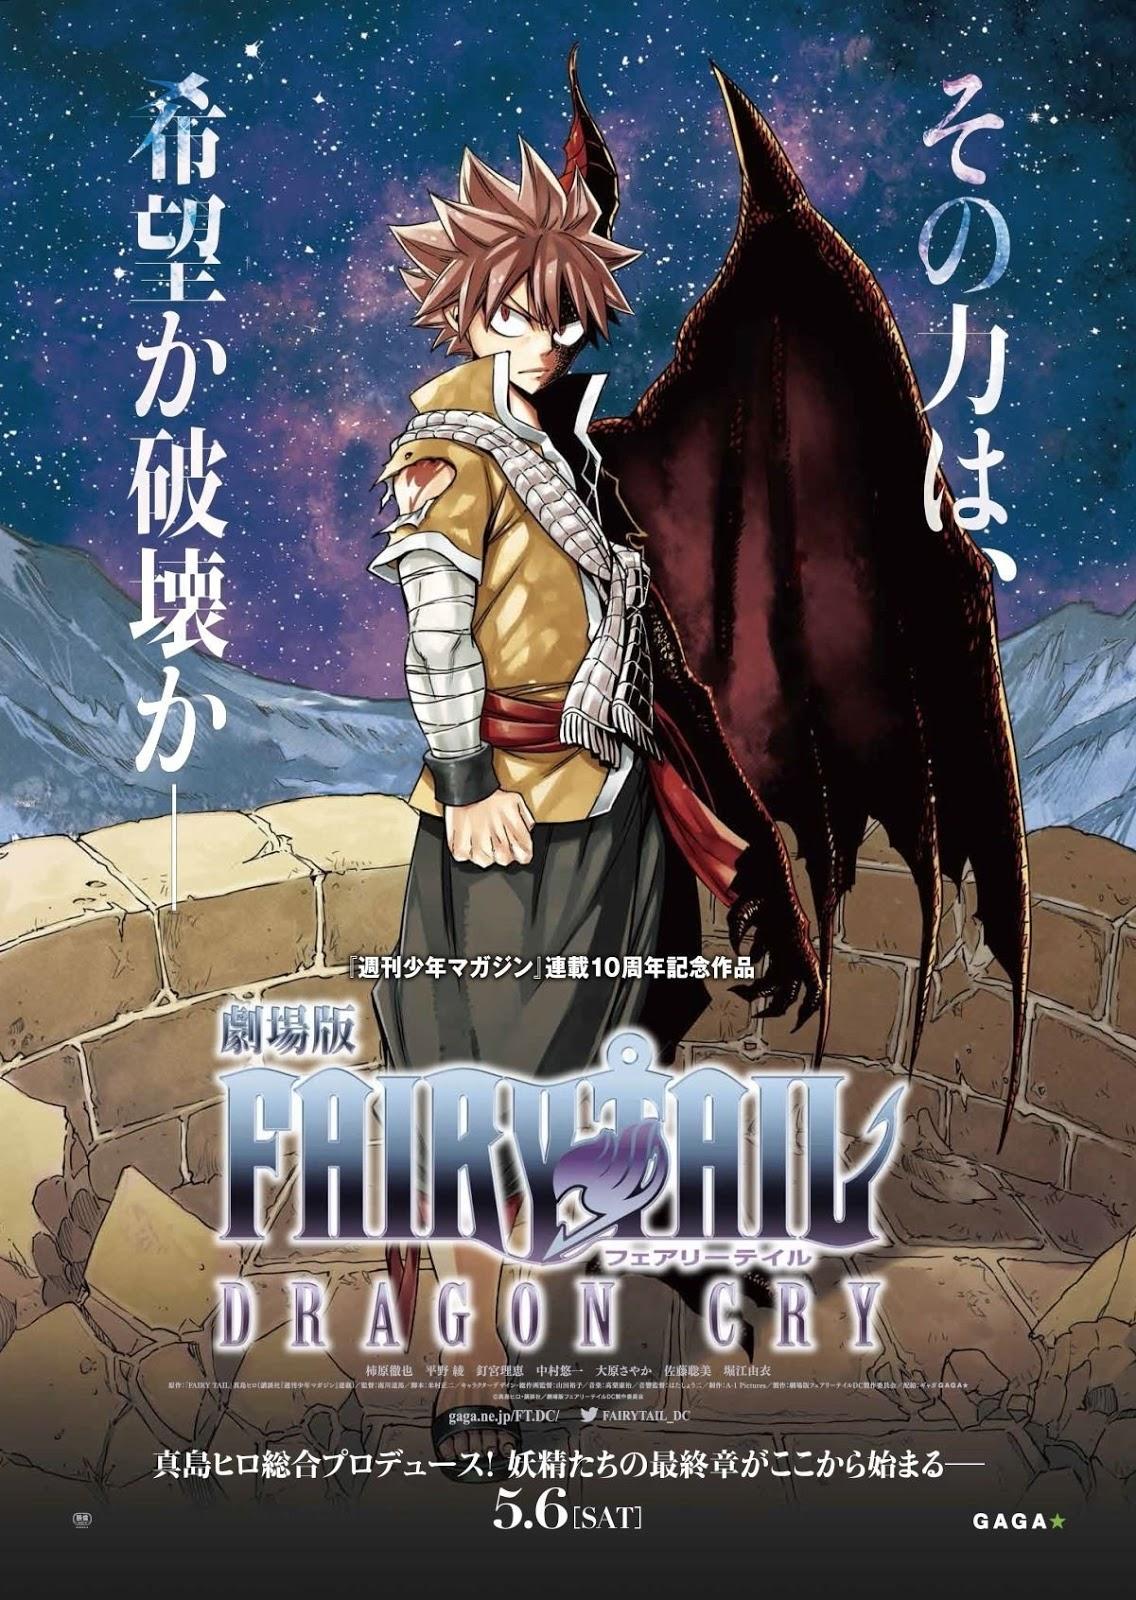 Fairy Tail: Dragon Cry (2017) แฟรี่เทล เดอะมูฟวี่ 2